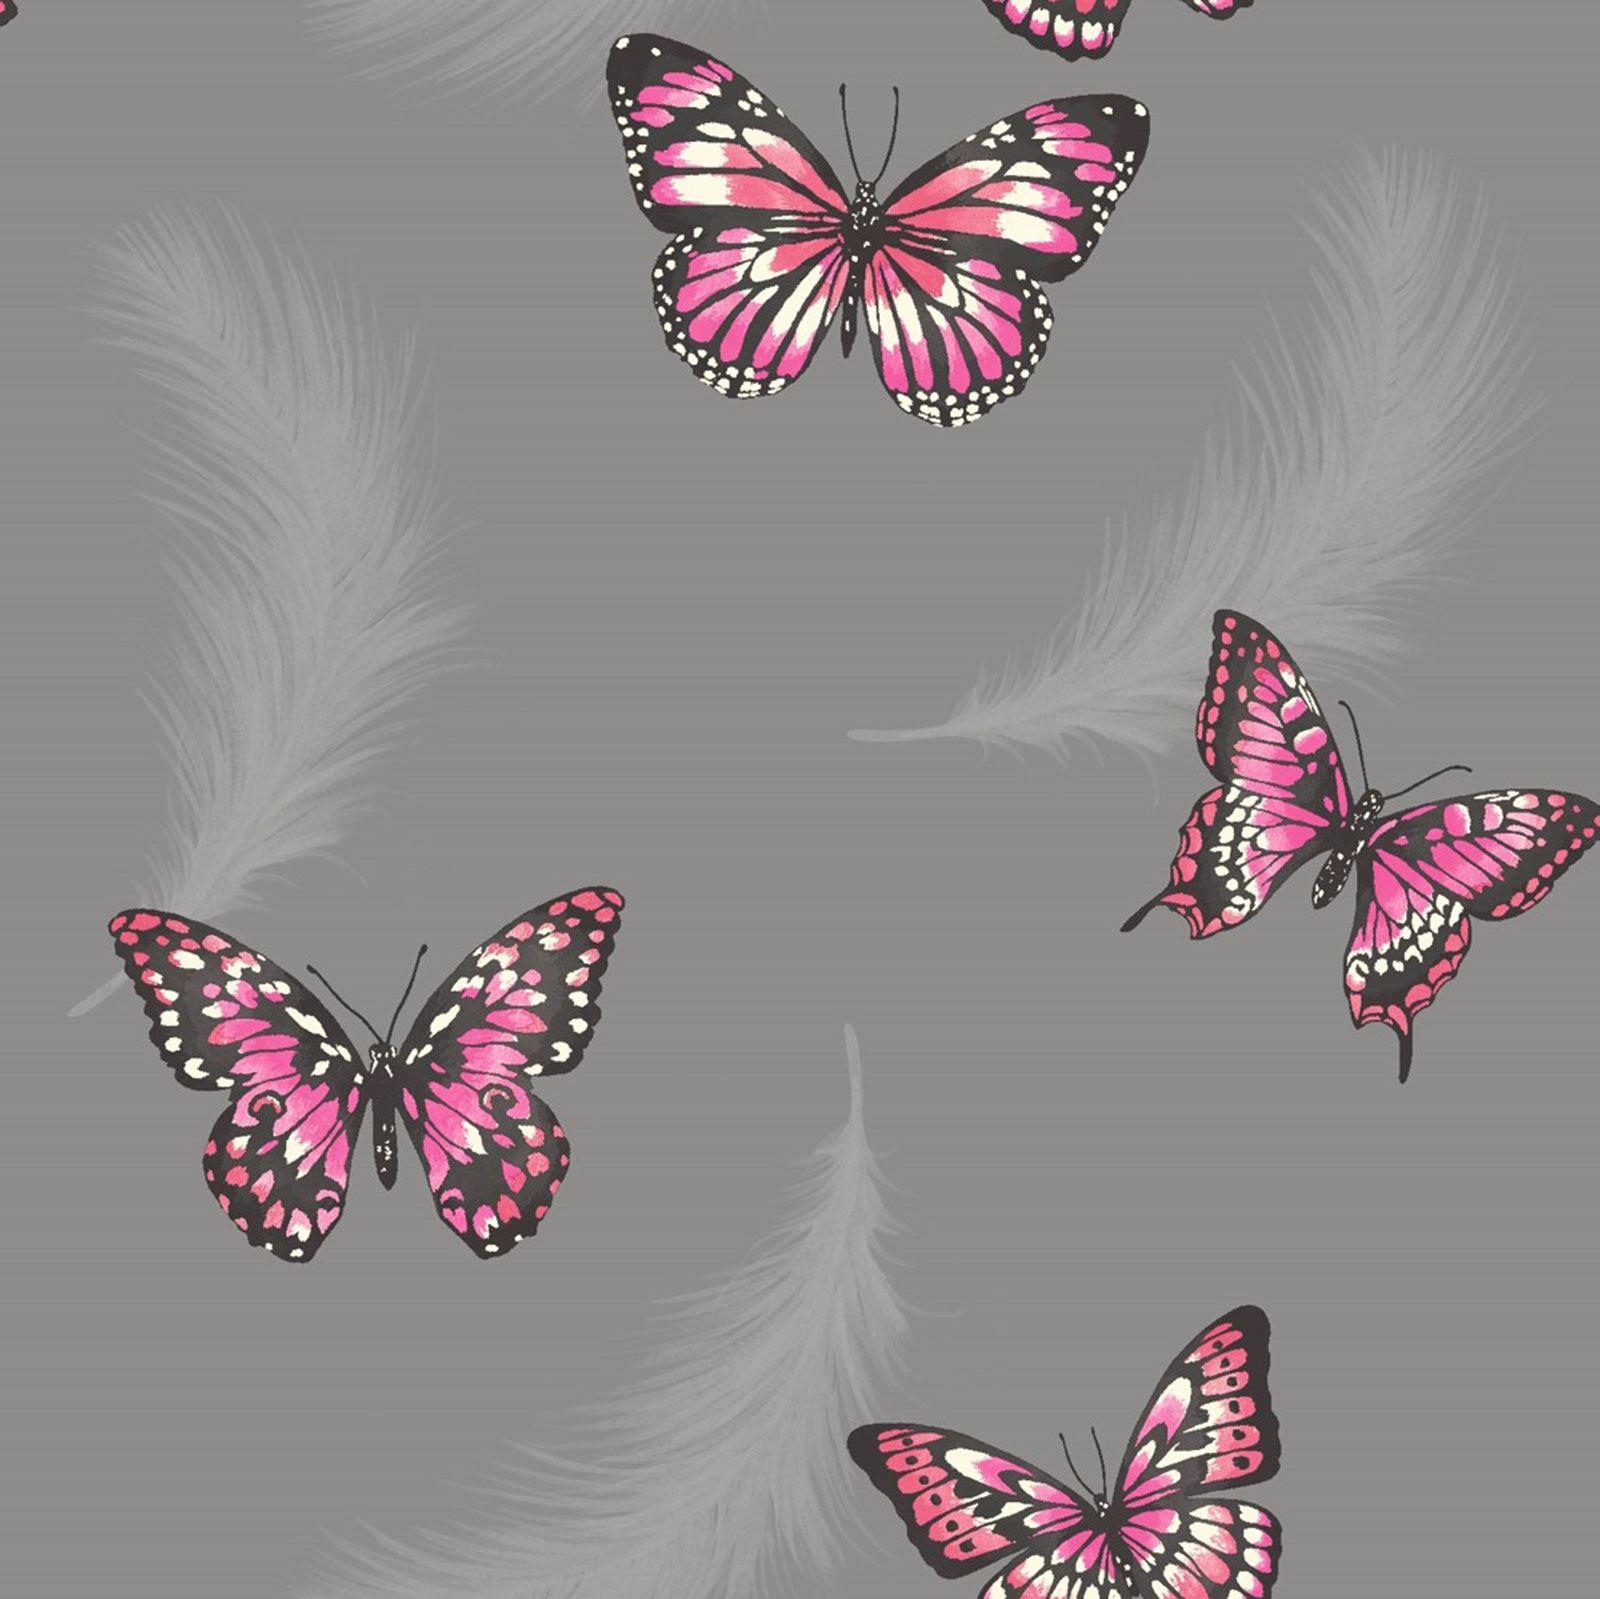 Pink Butterfly Wallpaper: BUTTERFLY WALLPAPER GIRLS BEDROOM DECOR PINK WHITE TEAL